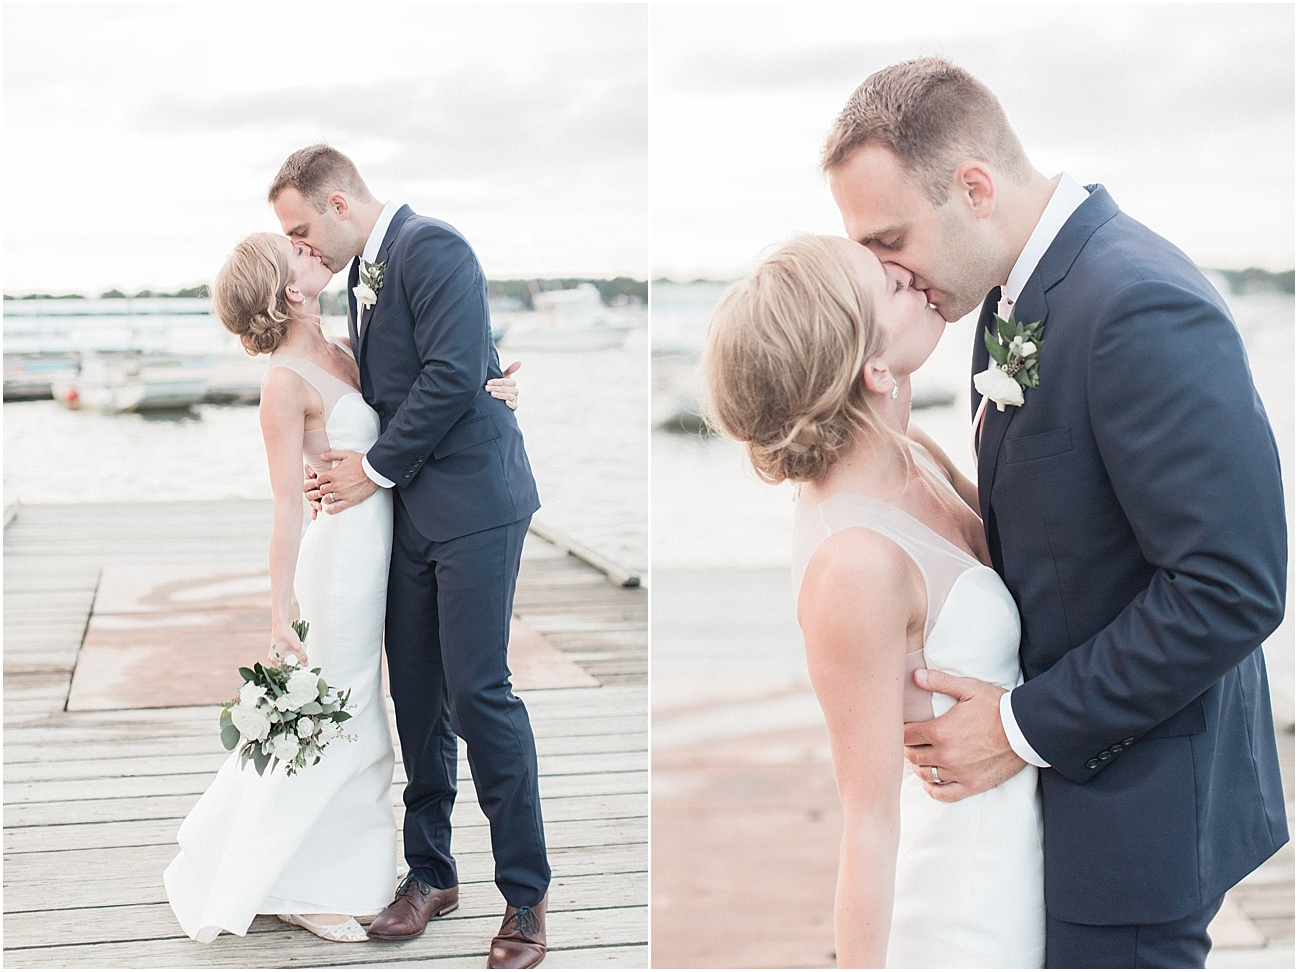 claire_gordon_duxbury_bay_maritime_school_beach_dock_powder_point_bridge_cape_cod_boston_wedding_photographer_meredith_jane_photography_photo_0607.jpg